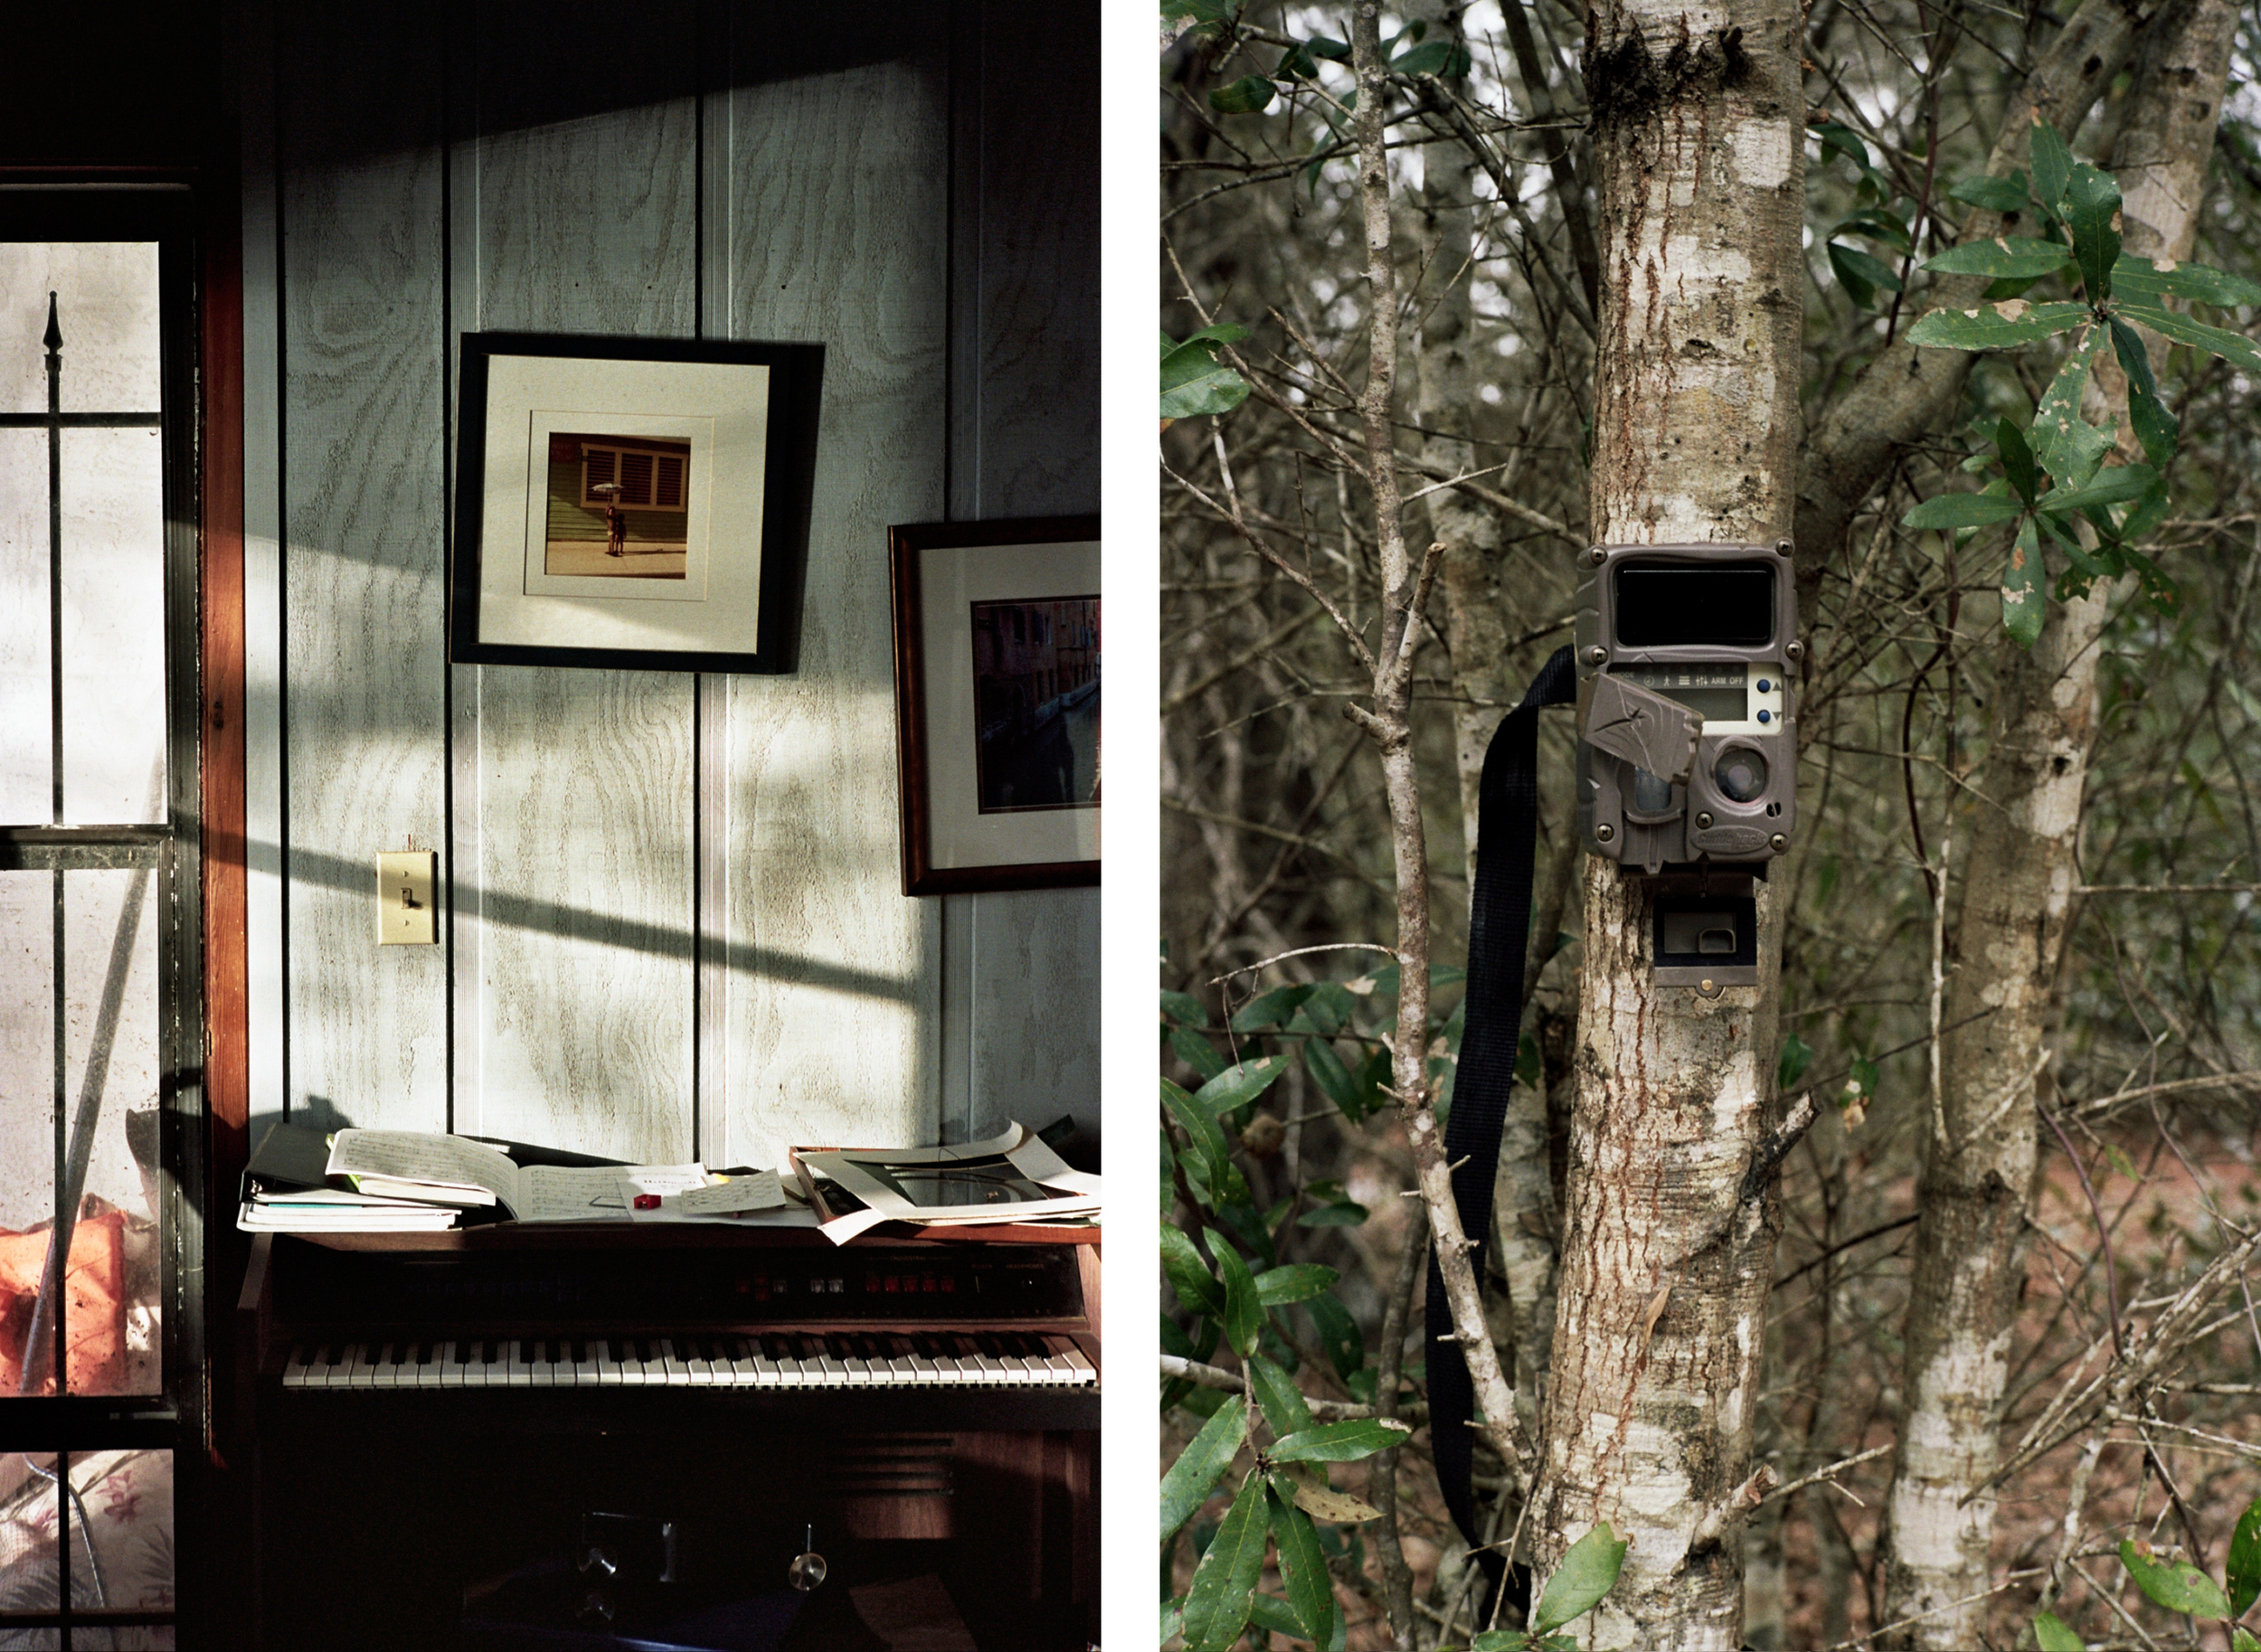 The Goggans Home, Nokomis, Florida , 10 x 15 inches, Digital pigment print, 2016; Trail Camera, Little Orange Creek Nature Preserve, Hawthorne, Florida , 10 x 15 inches, Digital pigment print, 2016